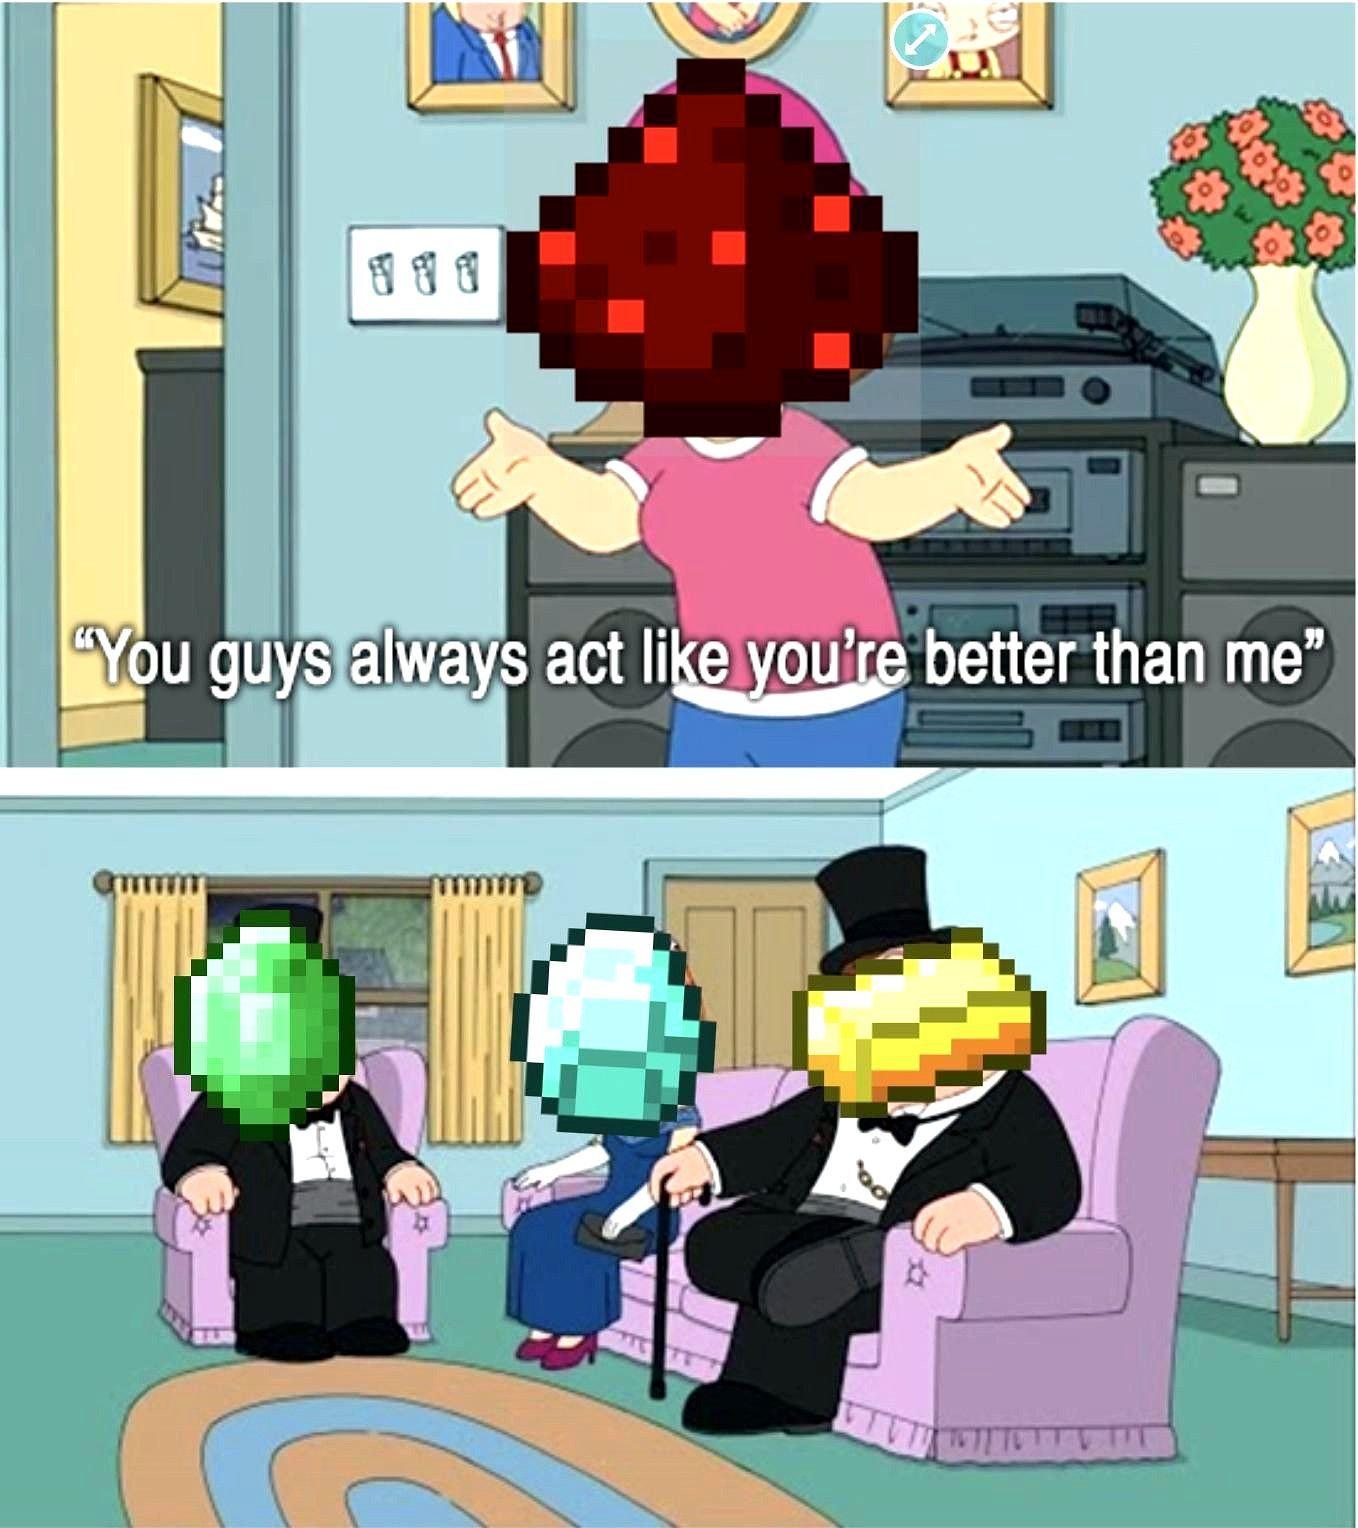 Best Funny Minecraft Memes Prestonplayz Memes Funny Memes Minecraft Prestonplayz Best Funny Minecraft M In 2020 Minecraft Memes Minecraft Funny Funny Memes